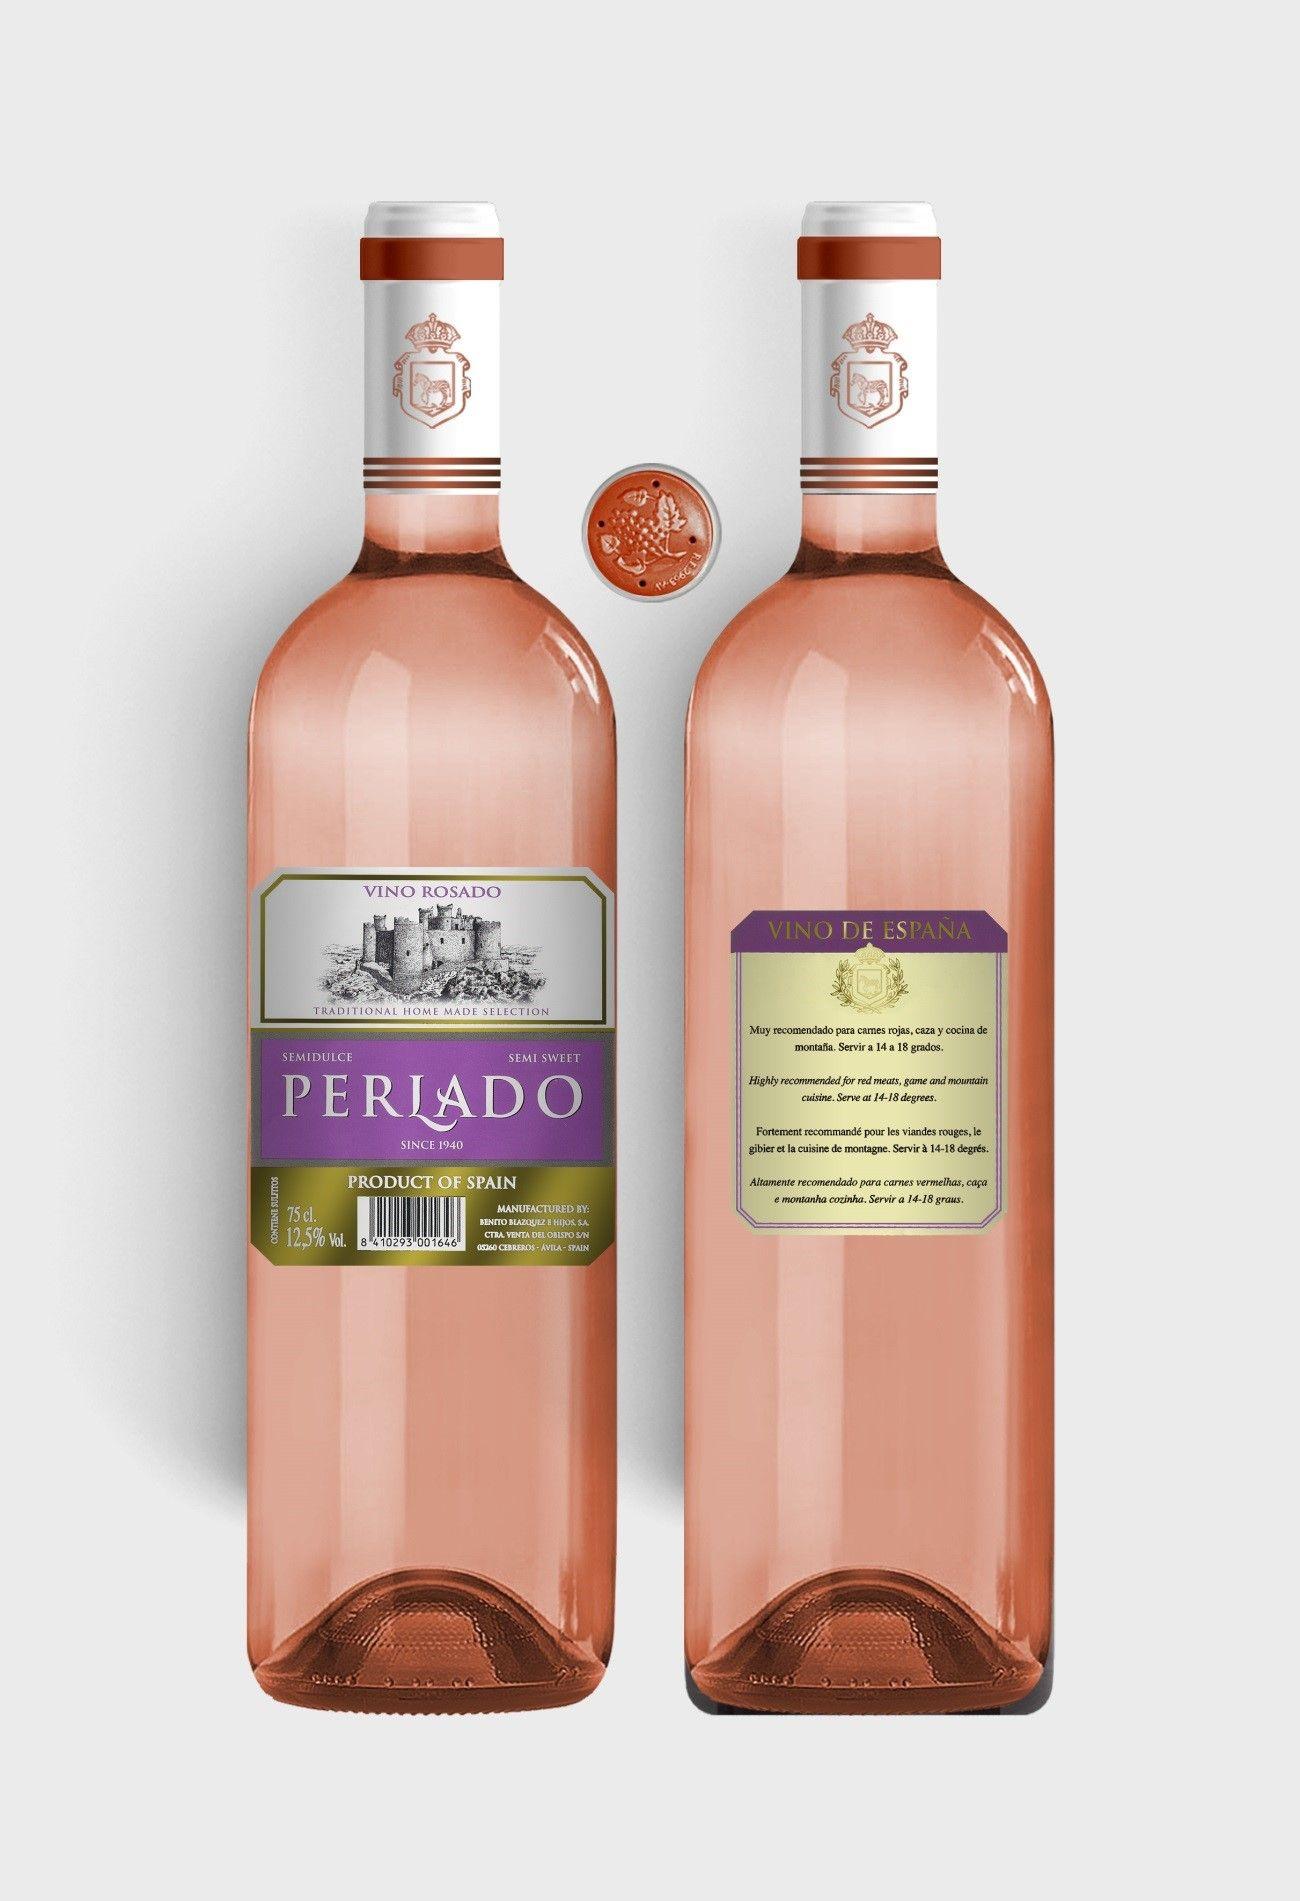 Benito Blázquez - Botella de Vino Perlado Semidulce Rosado